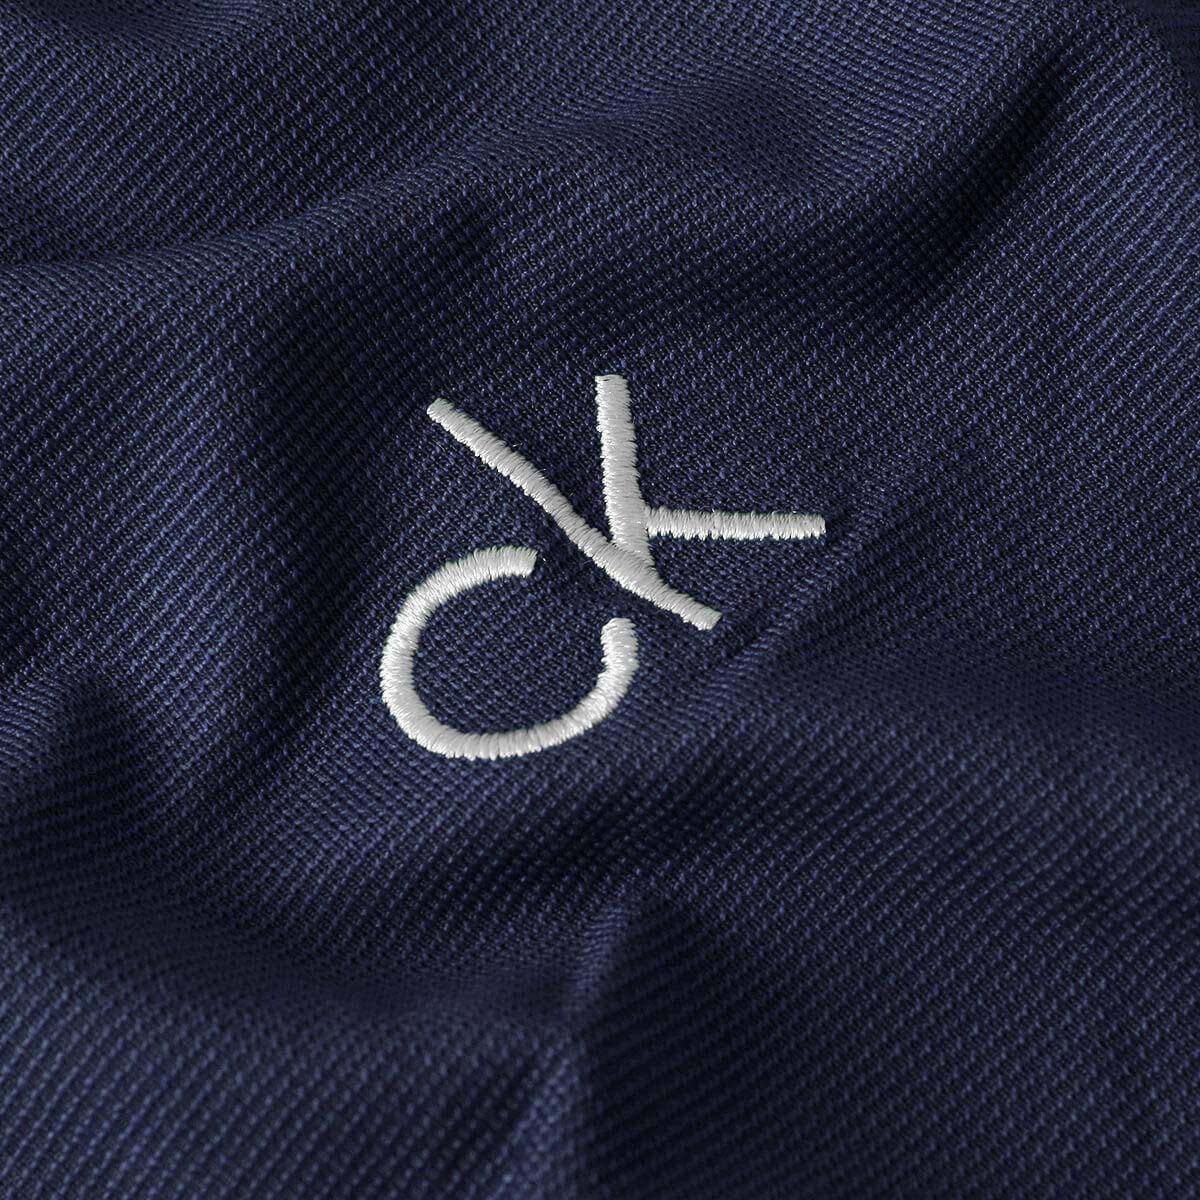 thumbnail 10 - Calvin Klein Mens 2021 Central Eco Light Wicking Golf Polo Shirt 28% OFF RRP